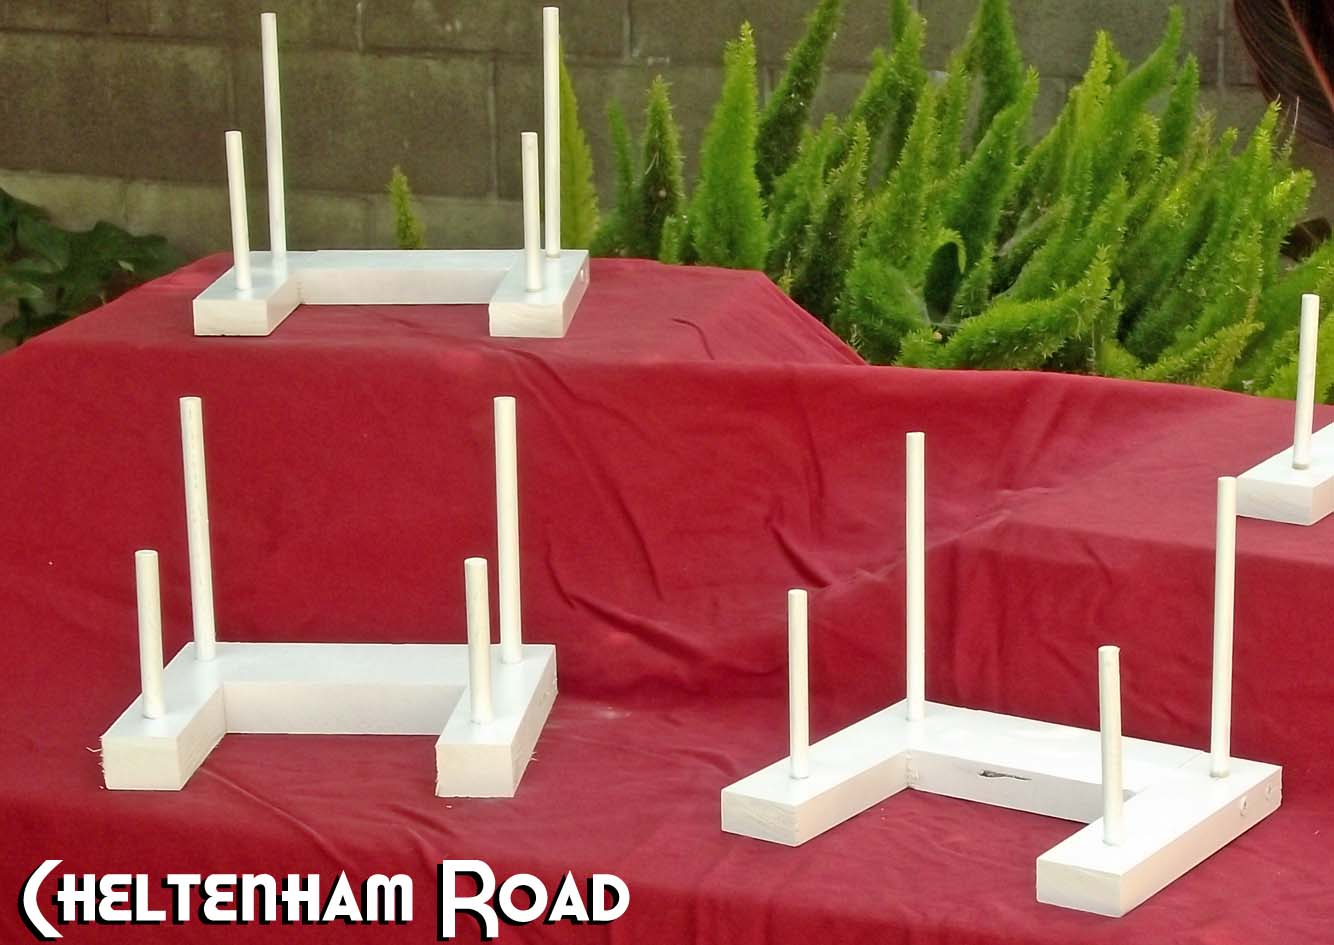 Exhibition Stand Tutorial : Craft show tips cheltenhamroad